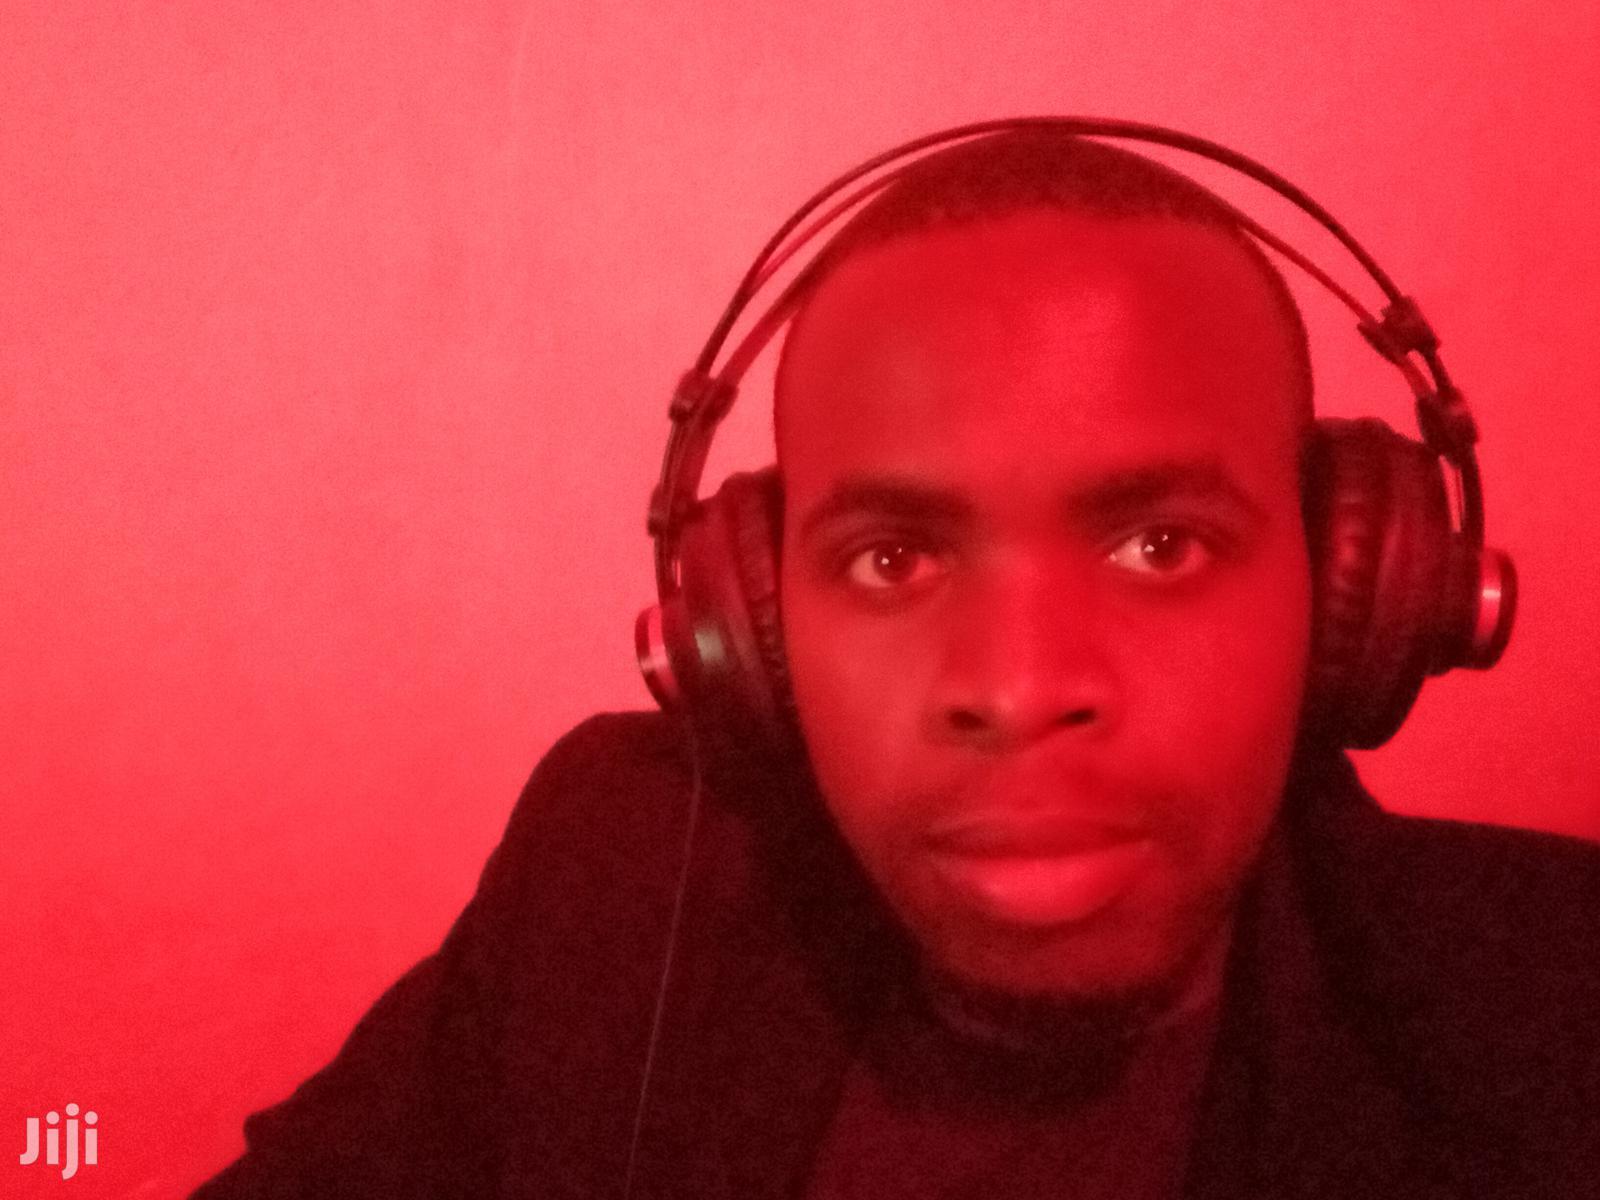 Music Producer/Sound Engineer